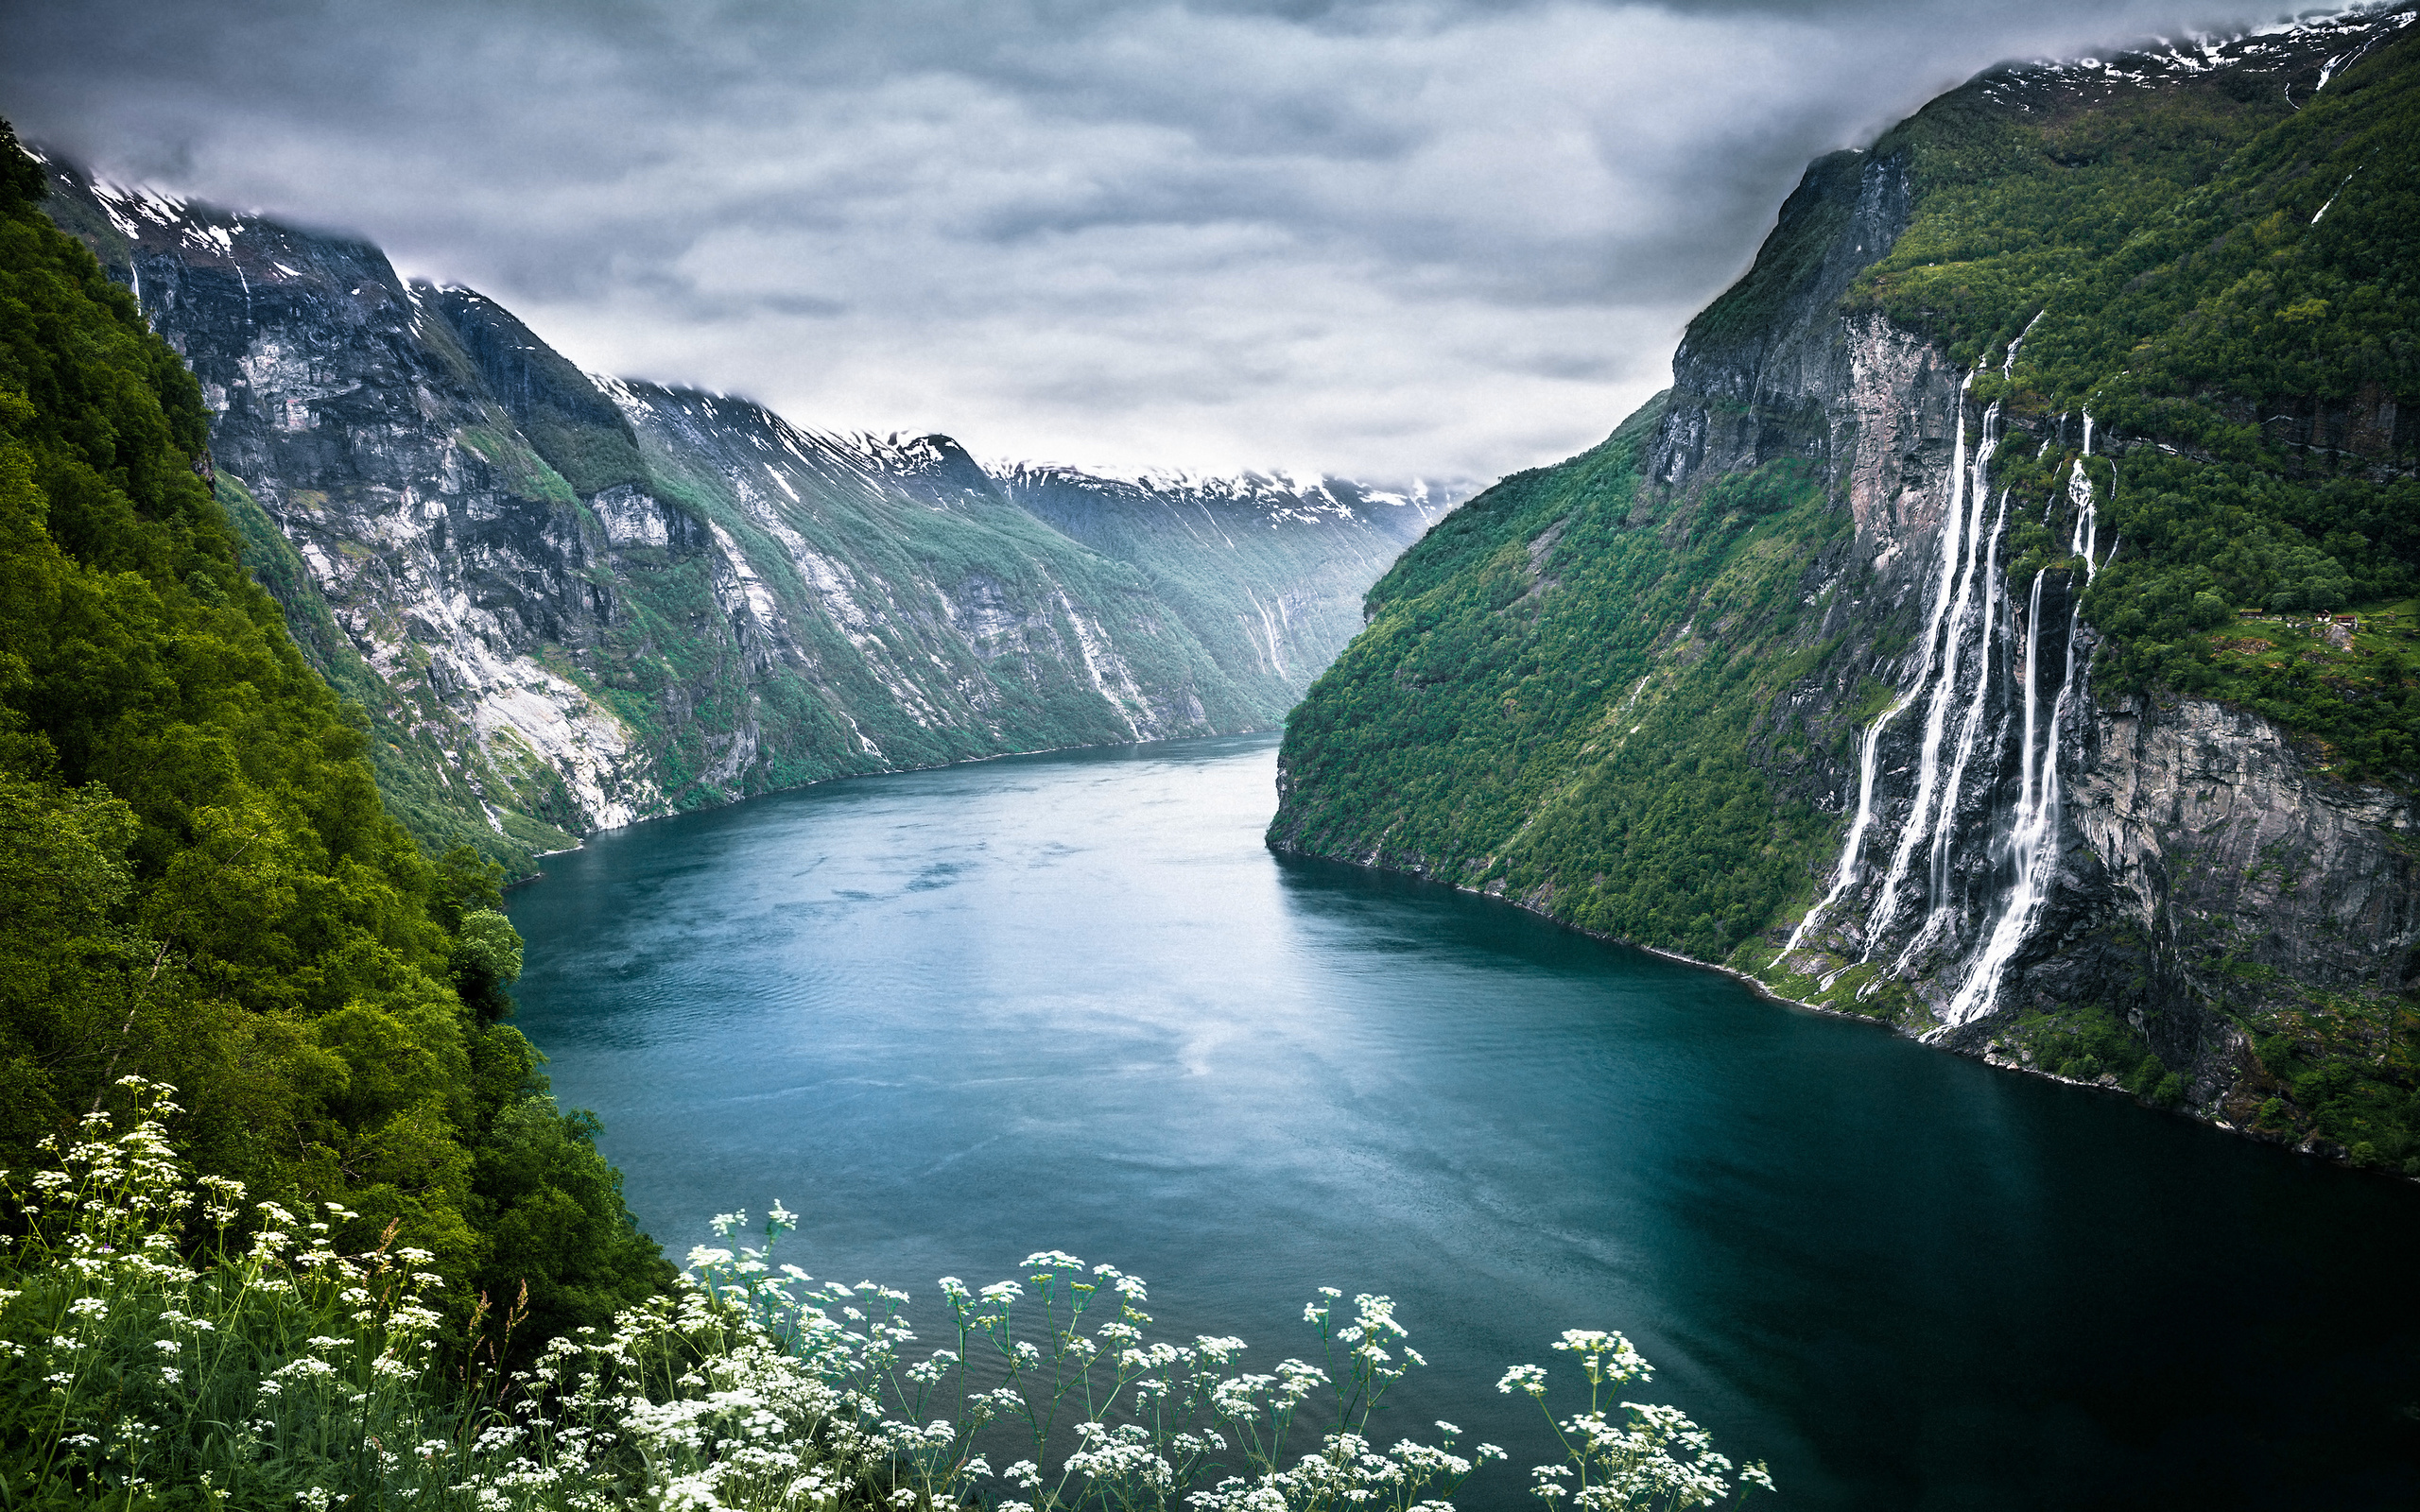 фото на тел город восс норвегия сердечками красивыми